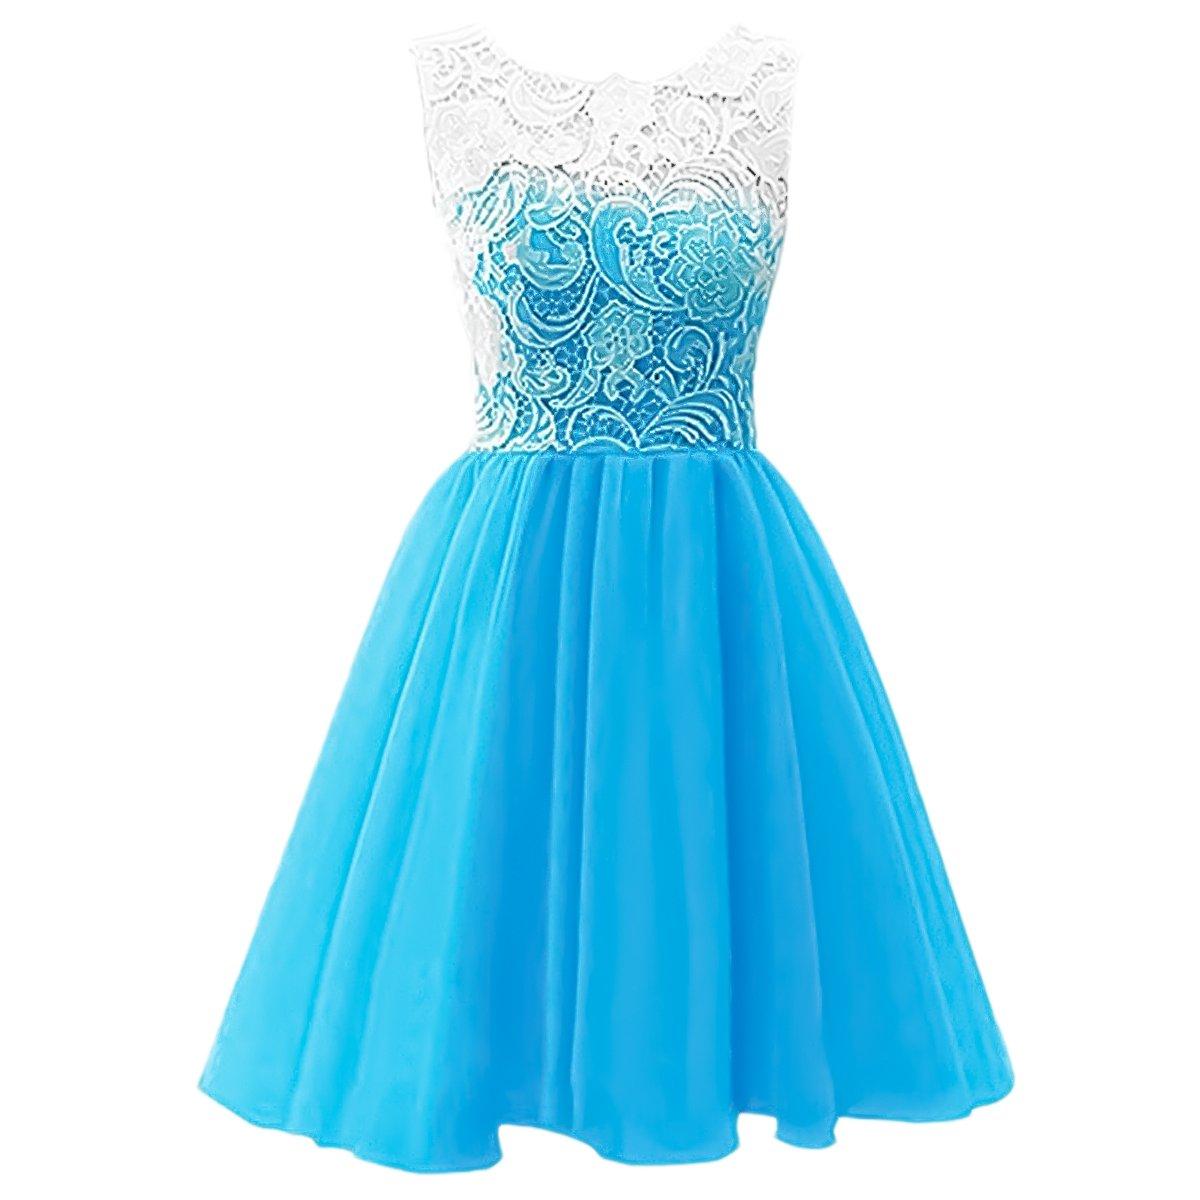 IBTOM CASTLE Big Girls' Chiffon Princess Juniors Bridesmaid Lace Summer Wedding Gown Party Flower Dress Blue 10-11 Years